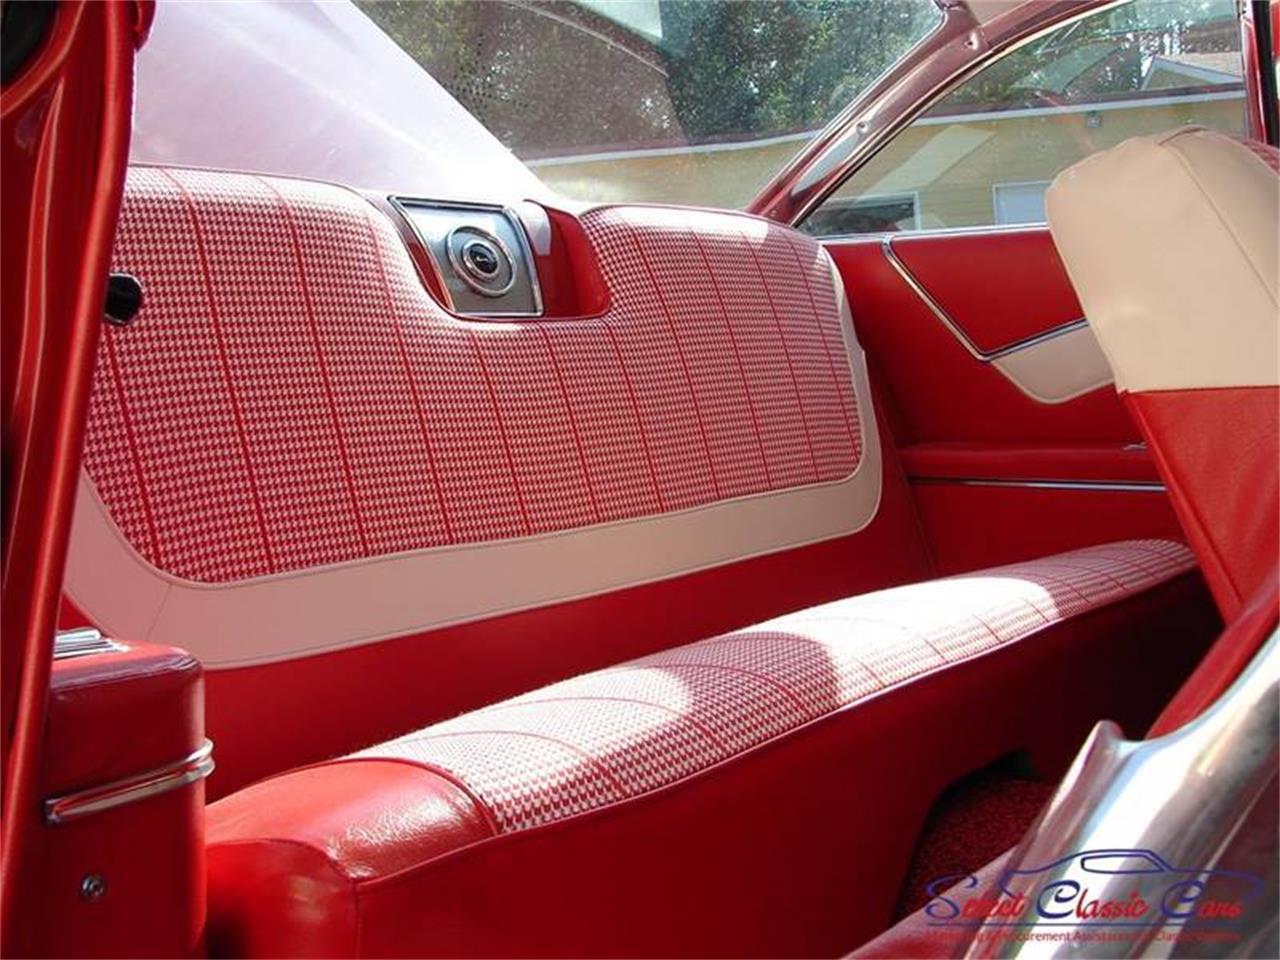 Large Picture of Classic 1960 Chevrolet Impala located in Hiram Georgia - $44,500.00 - L613